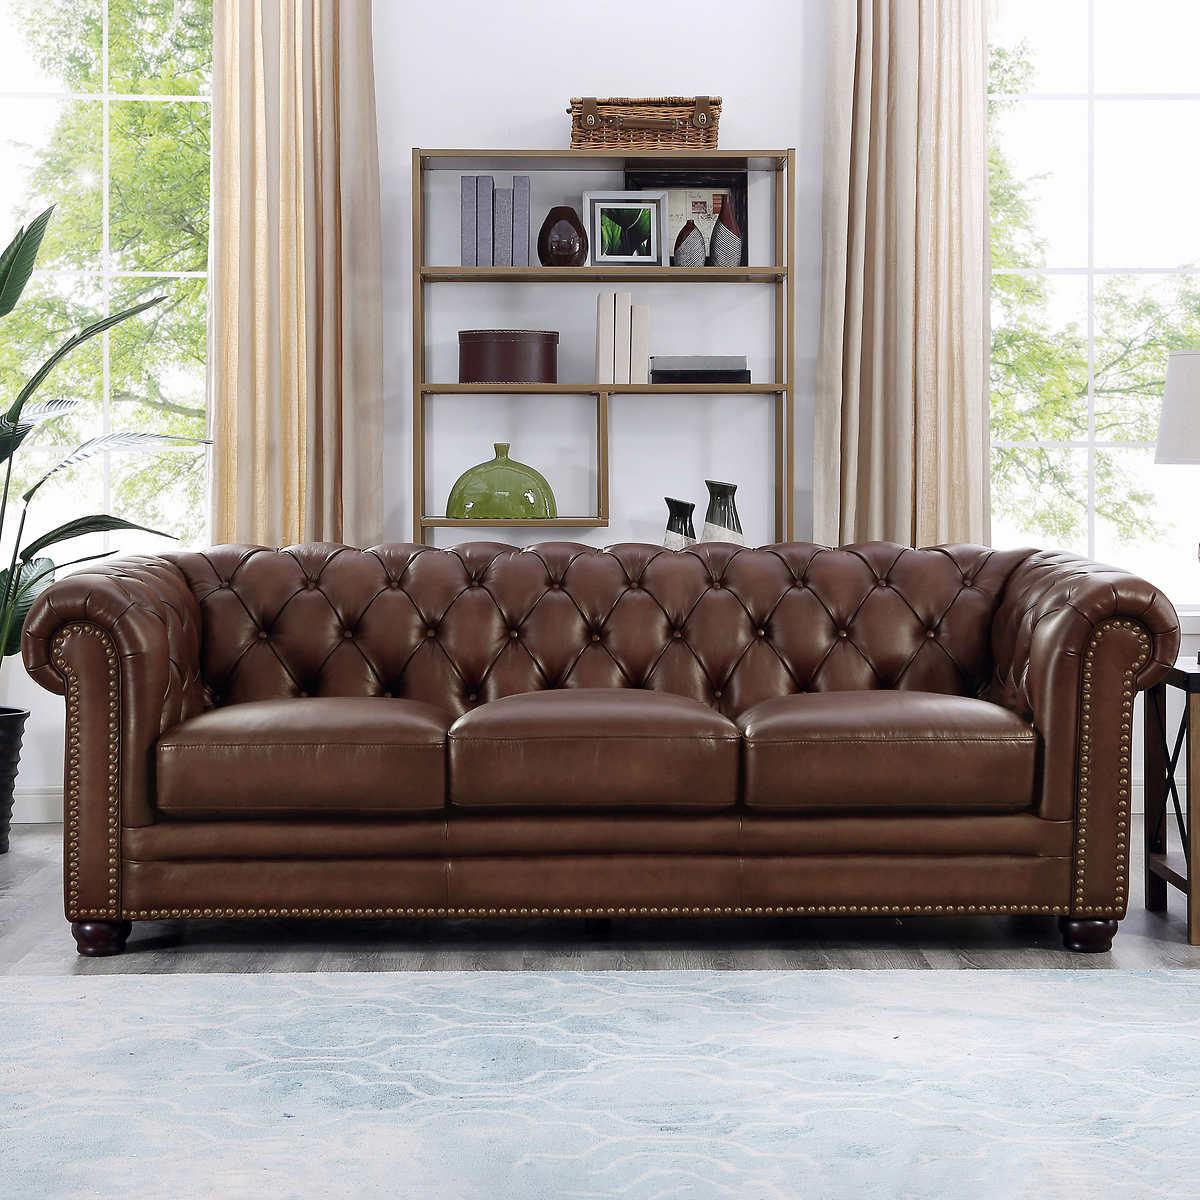 Allington Top Grain Leather Sofa Brown